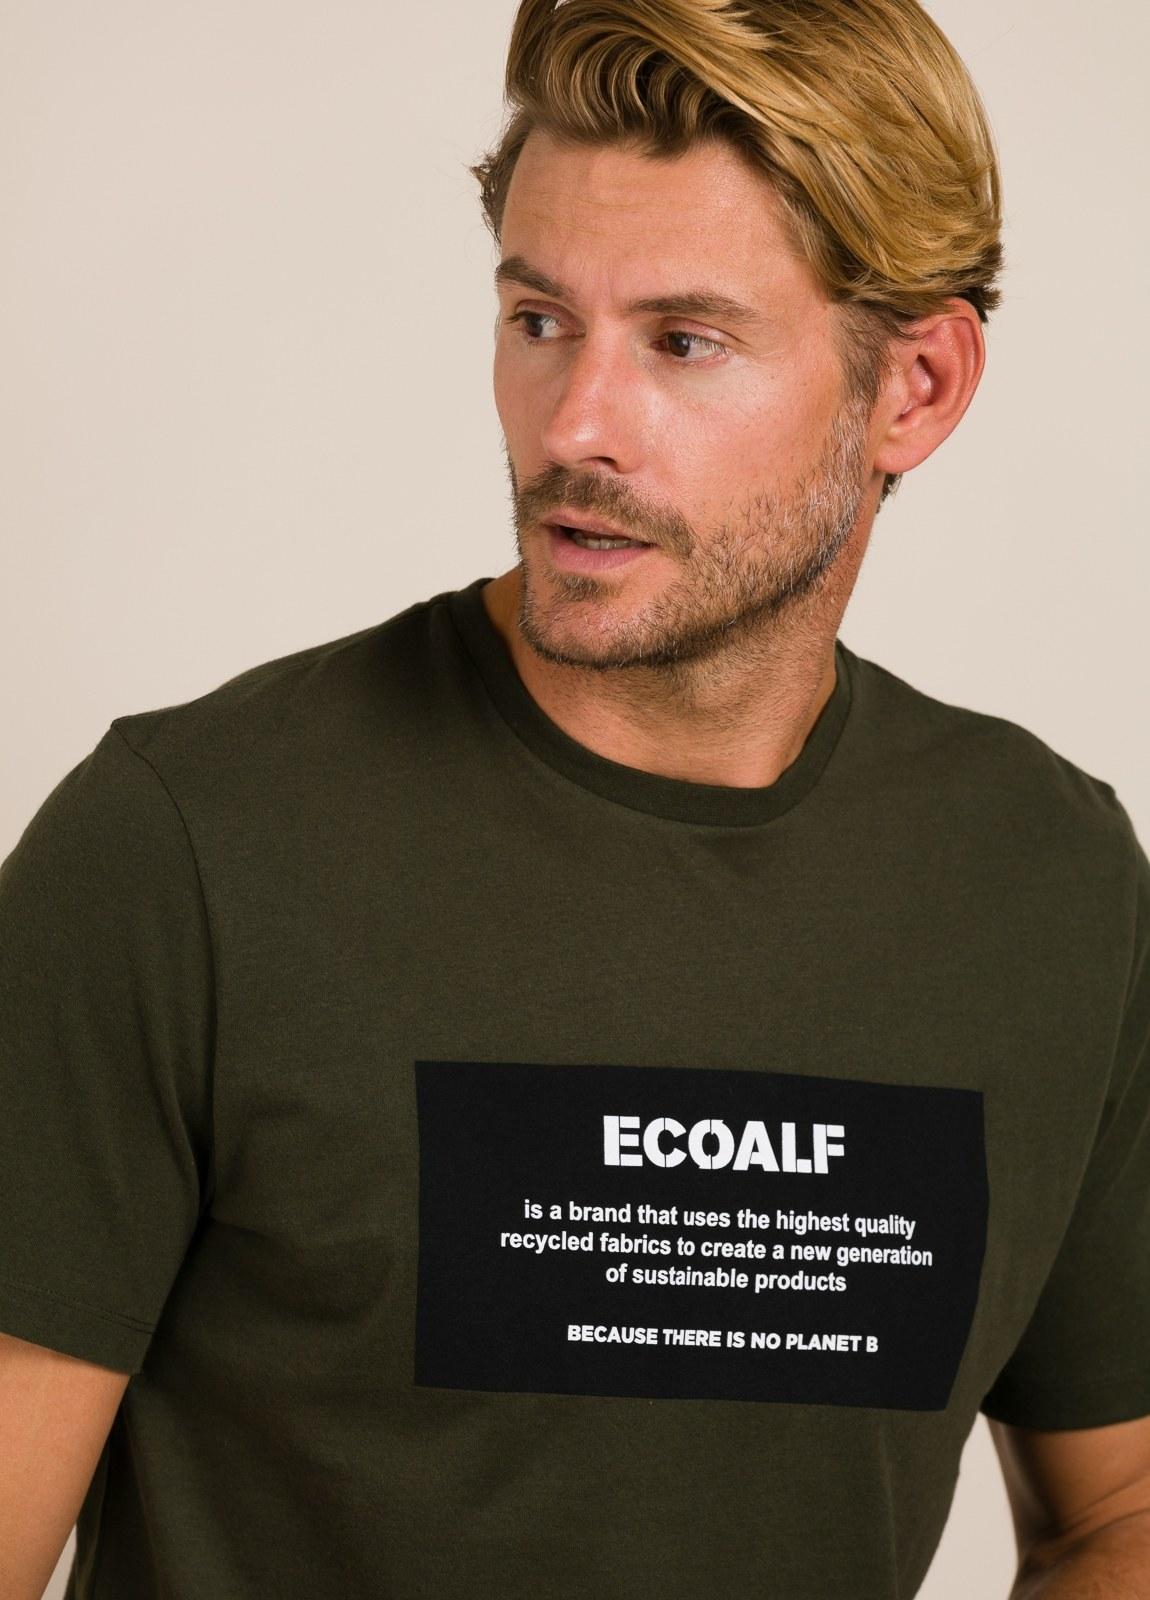 Camiseta verde ECOALF con texto estampado - Ítem2